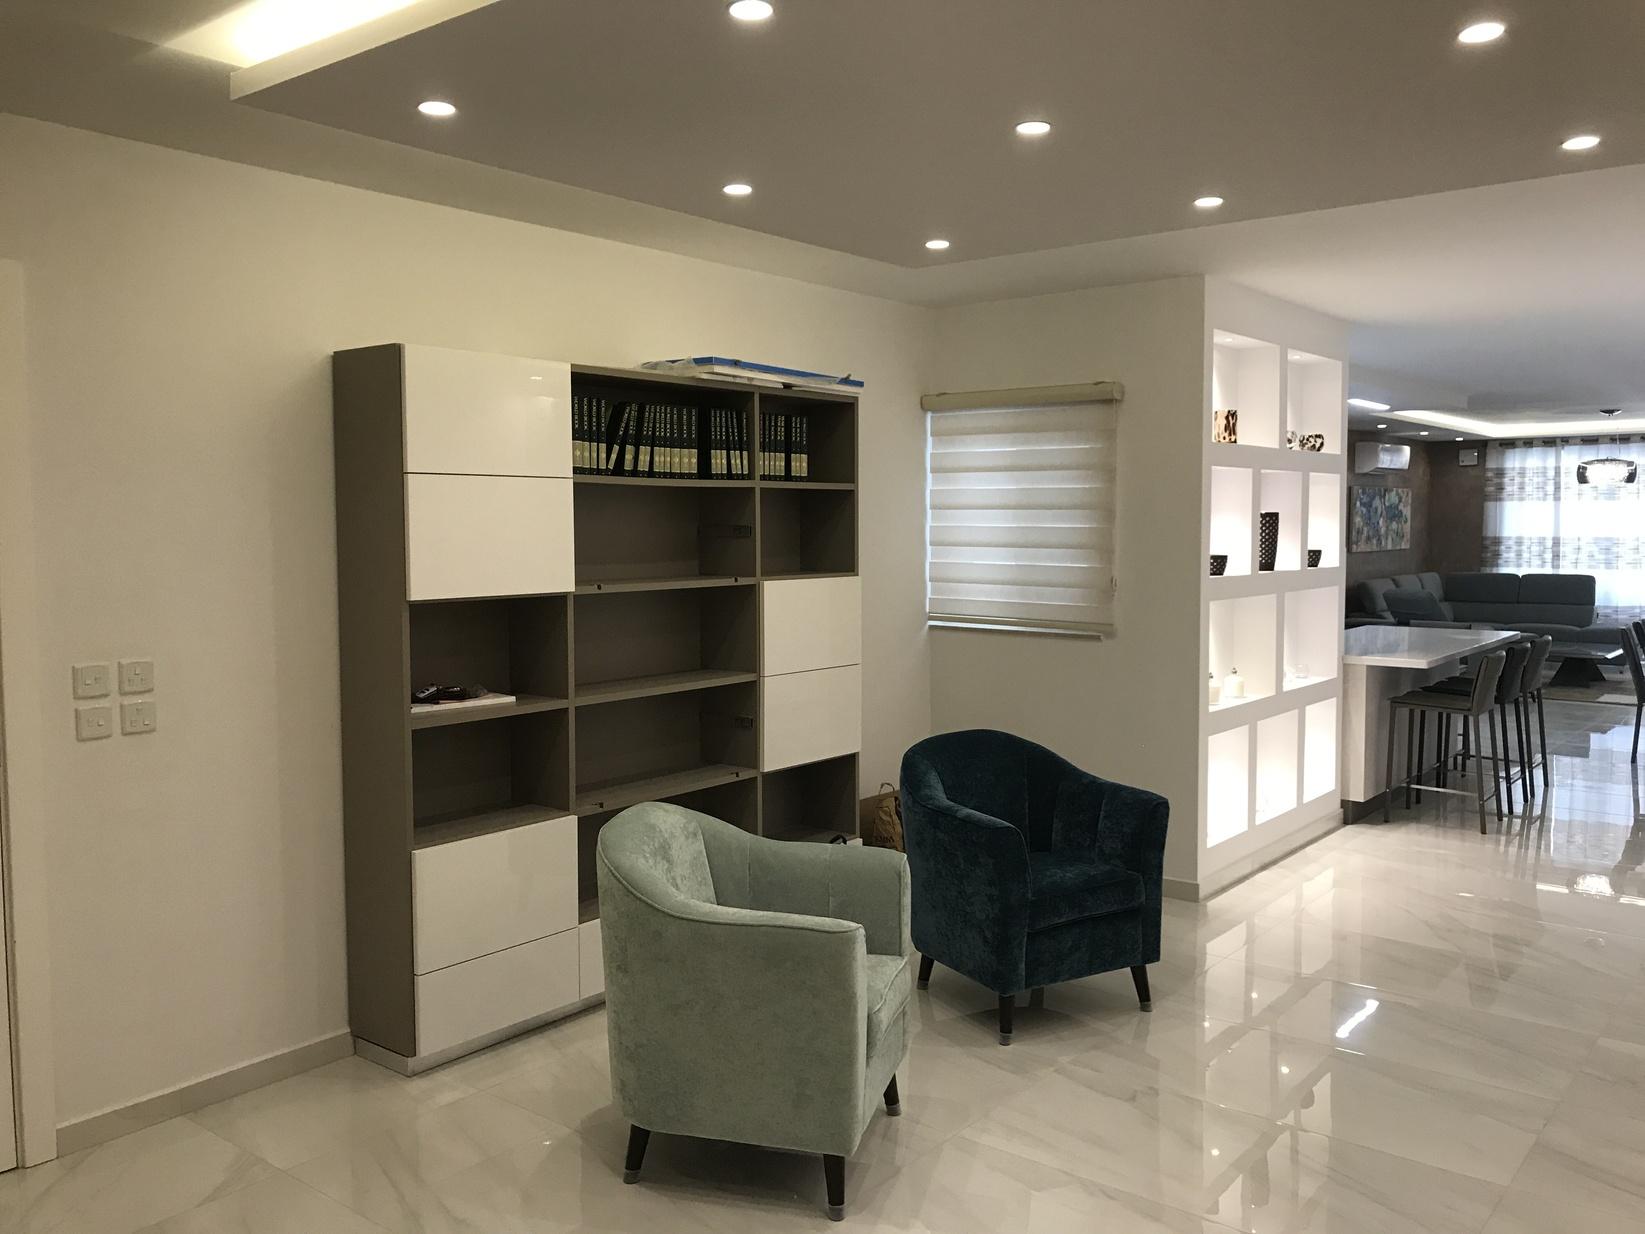 3 bed Apartment For Rent in Qawra, Qawra - thumb 10